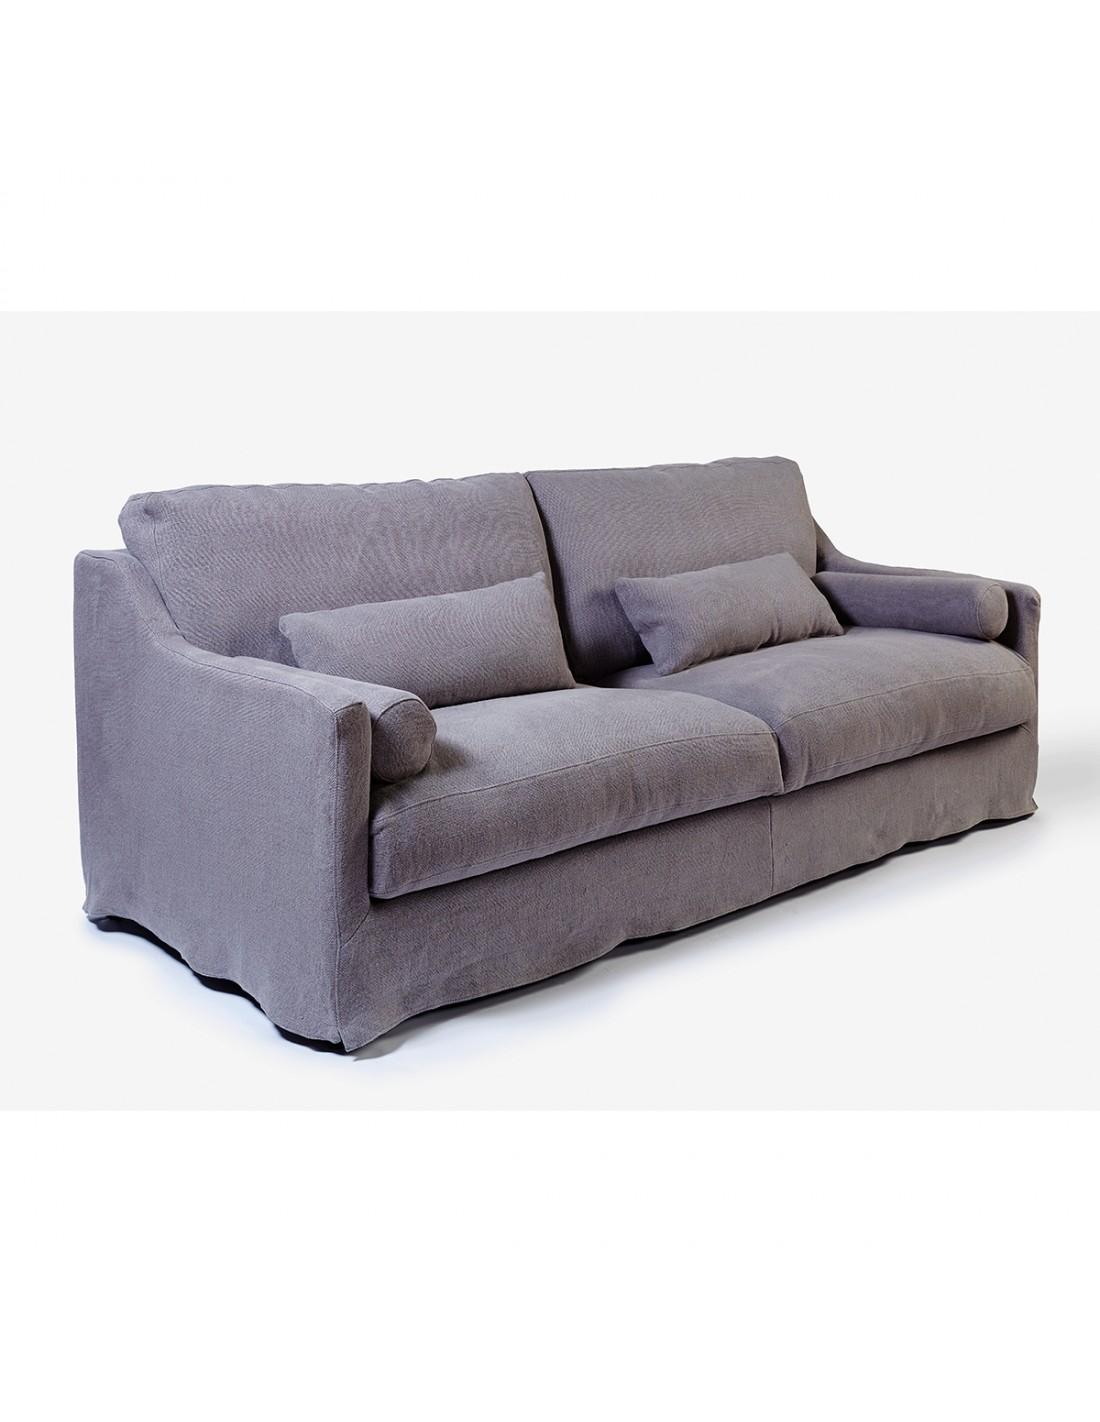 Sofa Lino Gris 2 Plazas 182x98x92